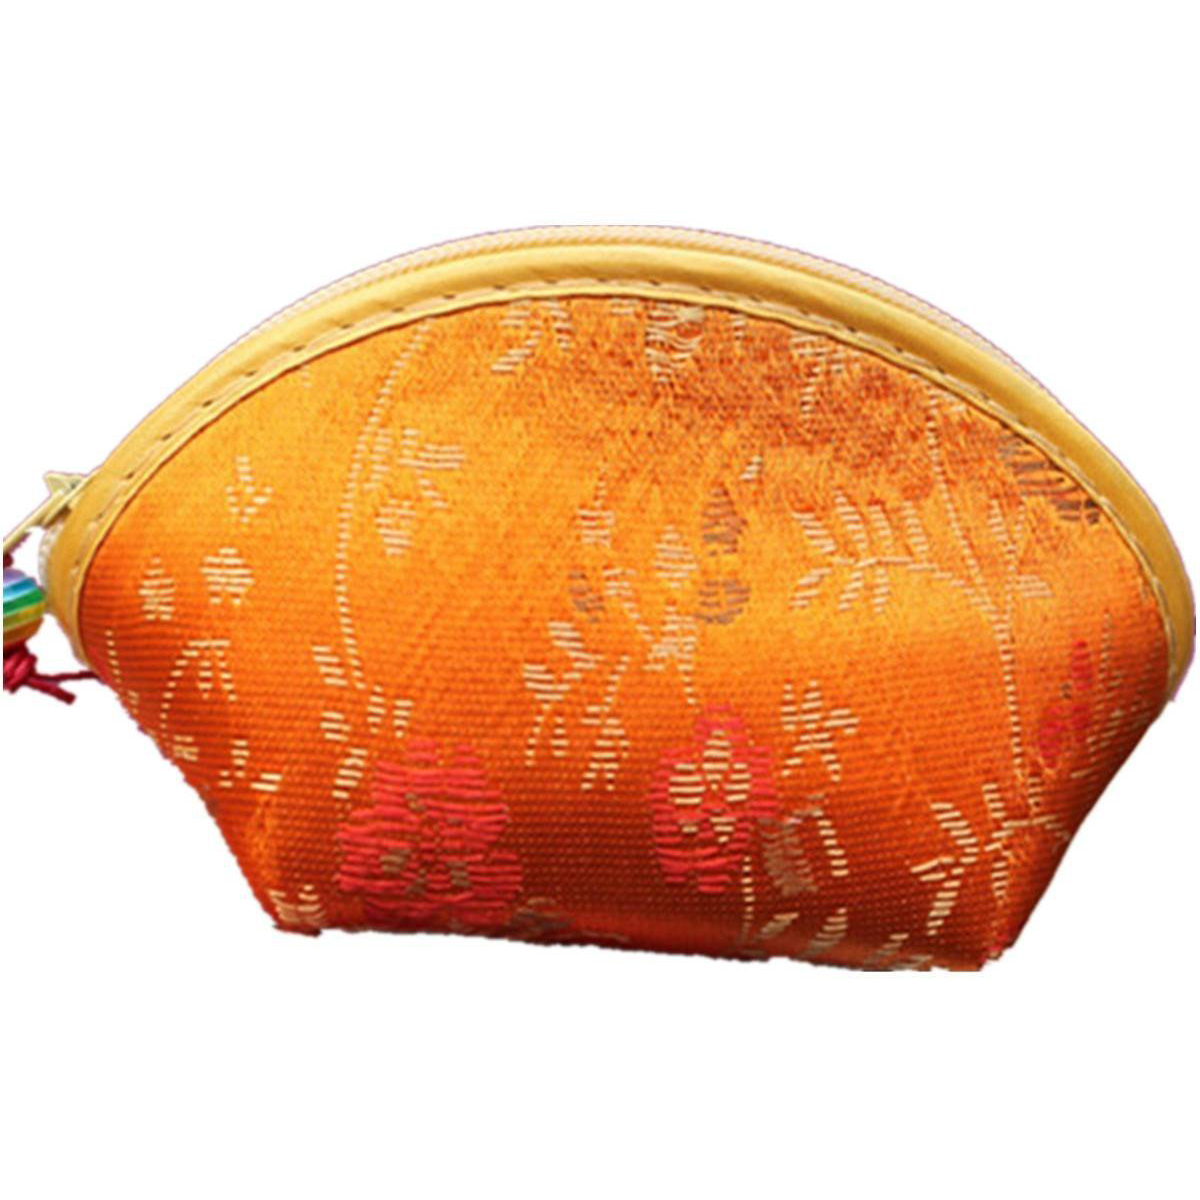 VSEN Hot Chinese Silk Embroidery Wallet Change Coin Bag Handbag Small Purse Pouch Random vsen hot noctilucent cat zipper coin case purse wallet pouch handbag bag